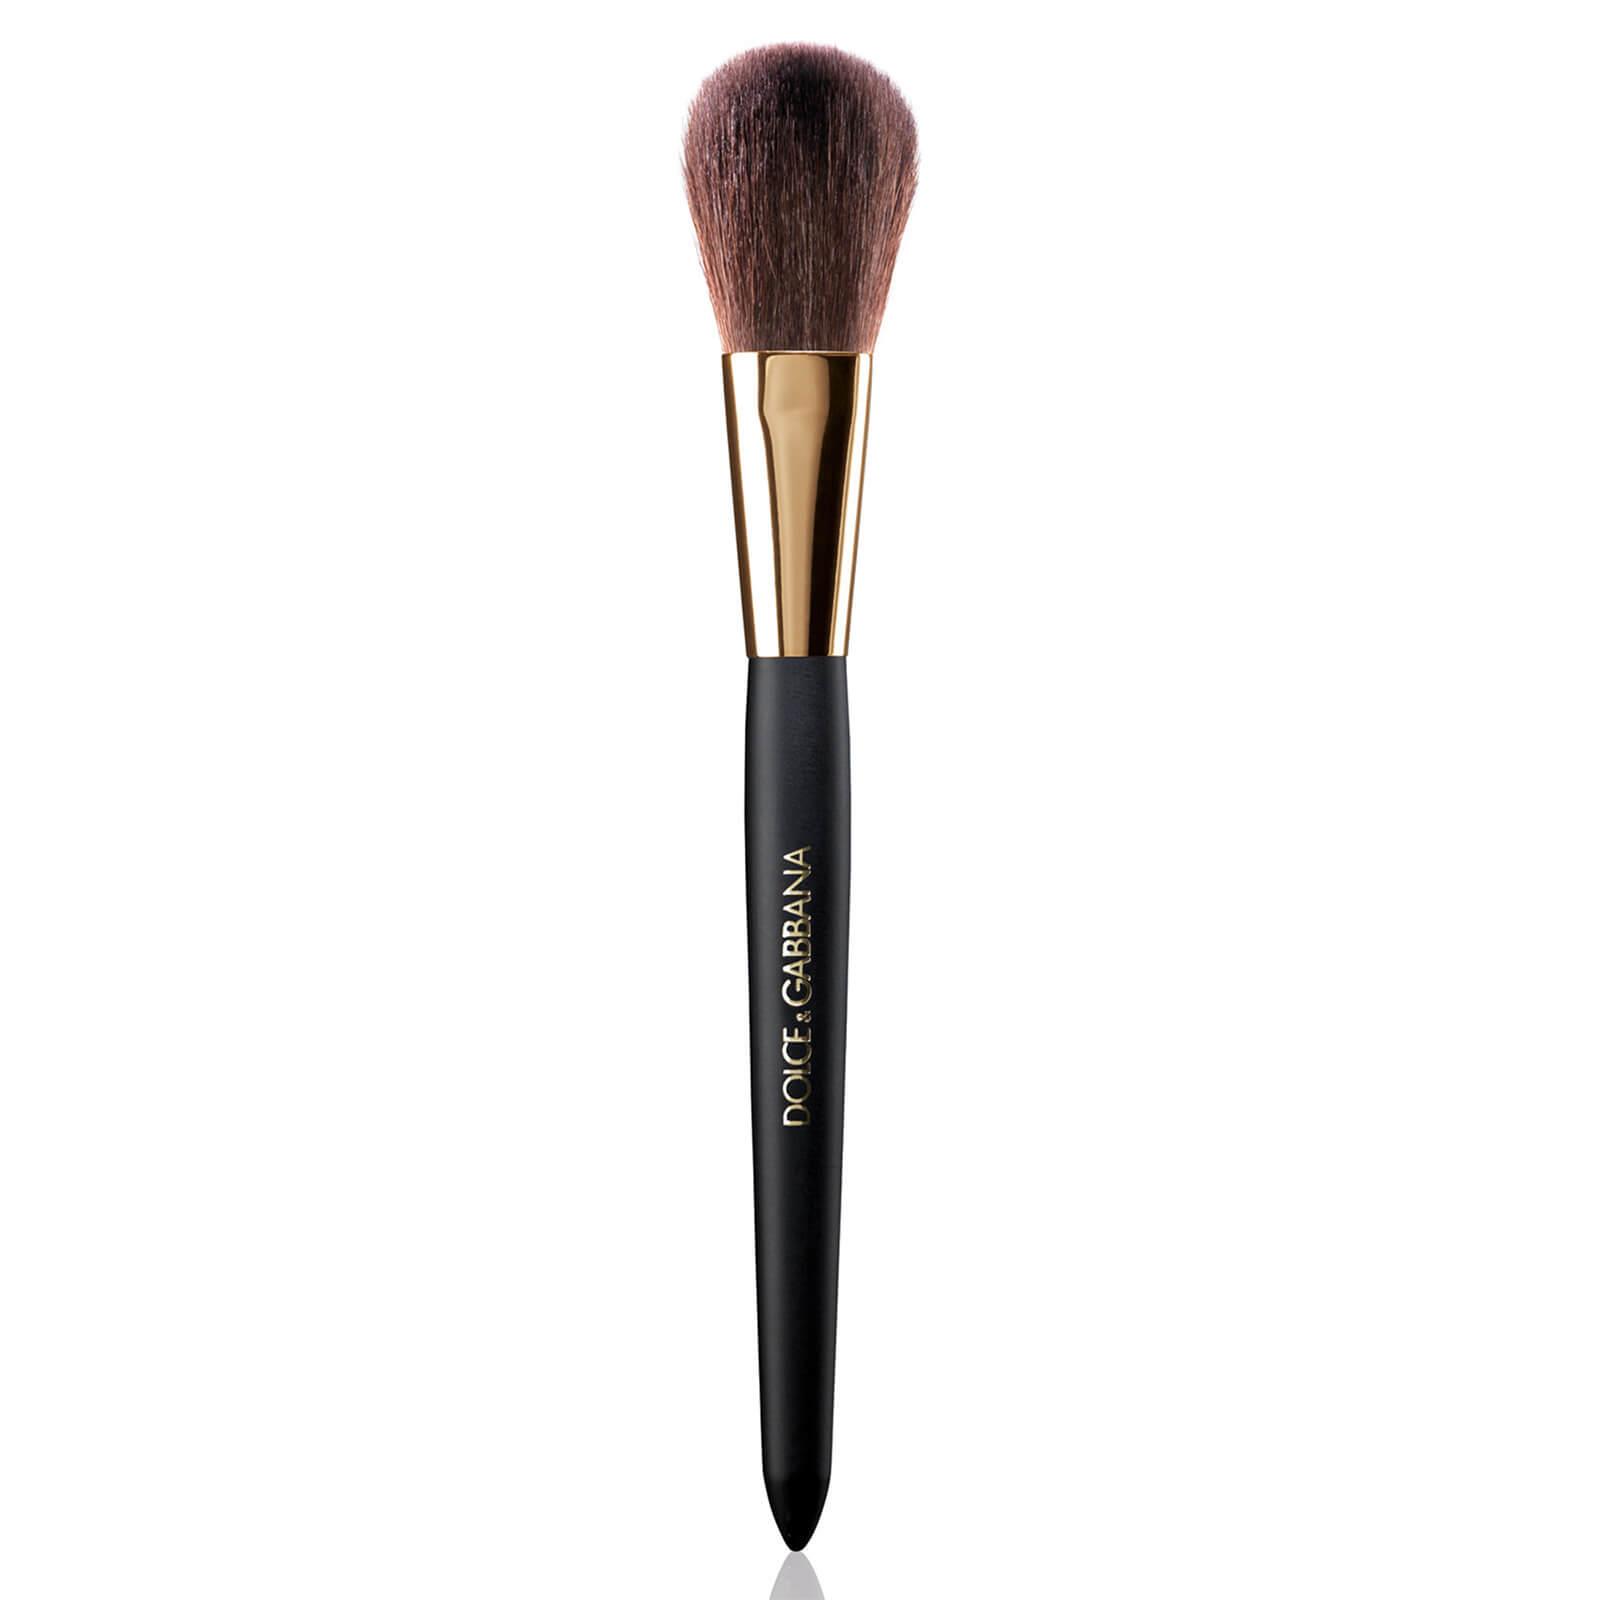 Купить Dolce&Gabbana Blush Brush